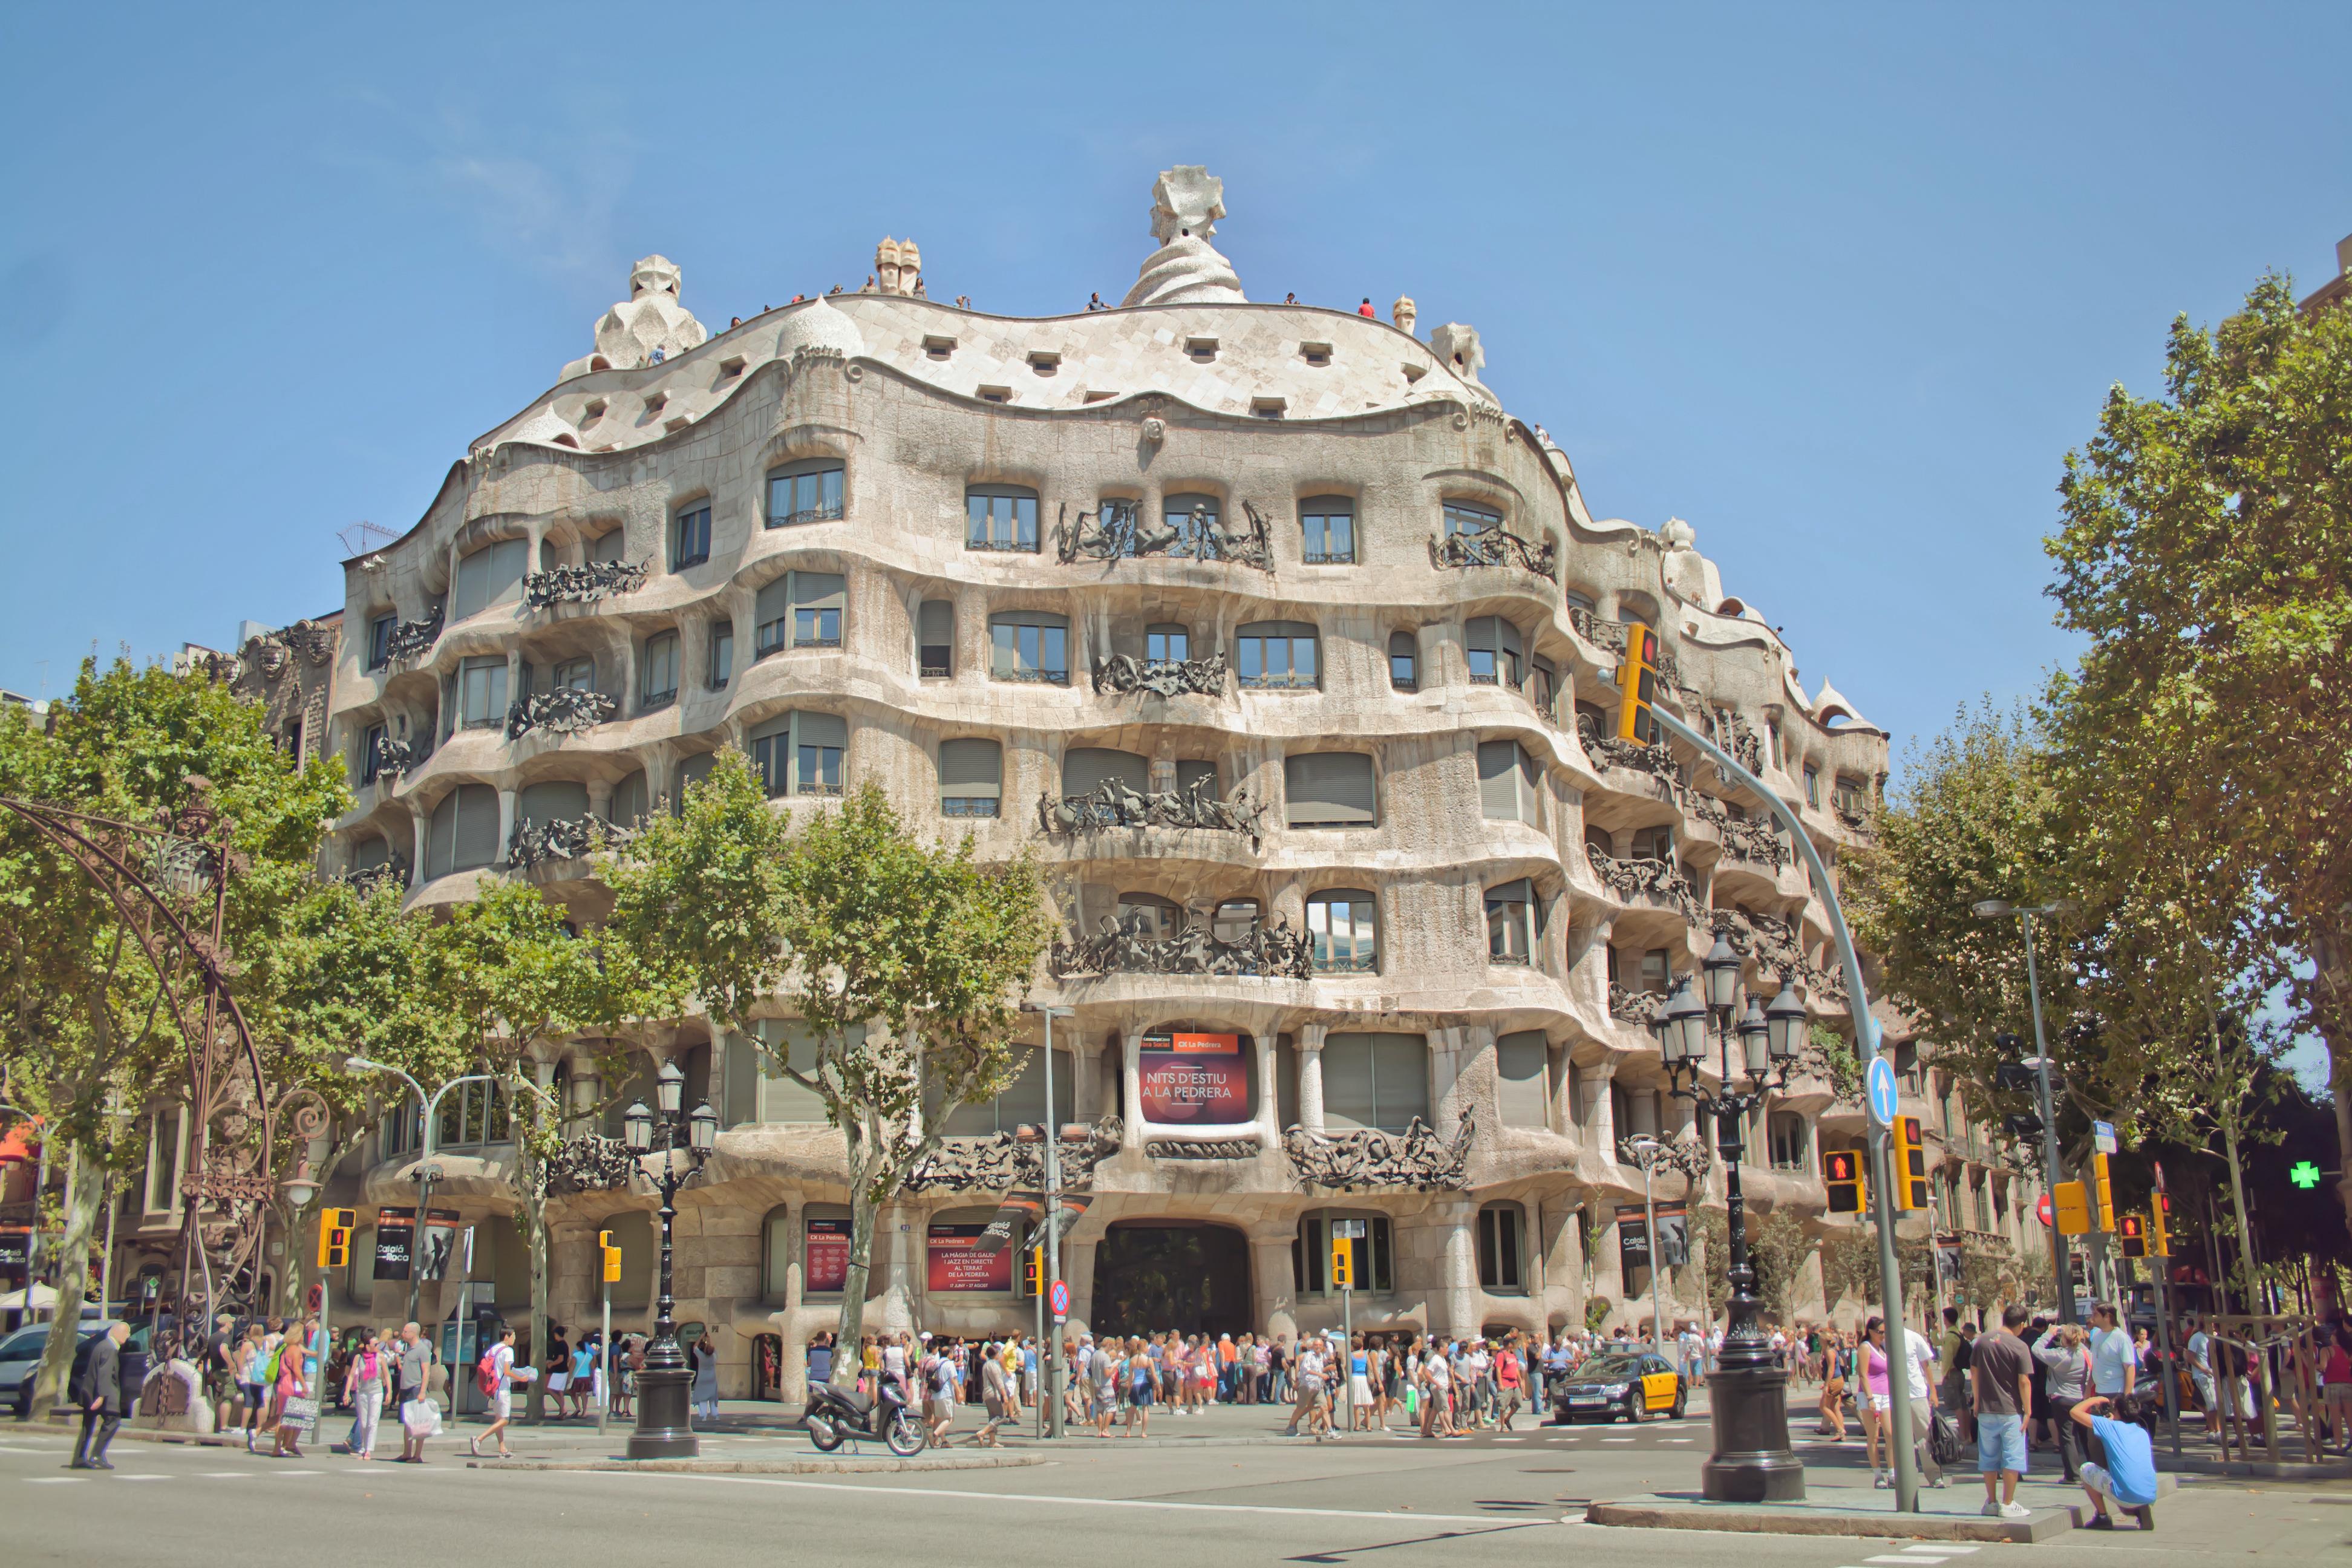 Museum restaurants in barcelona shbarcelona - Casa mila la pedrera ...